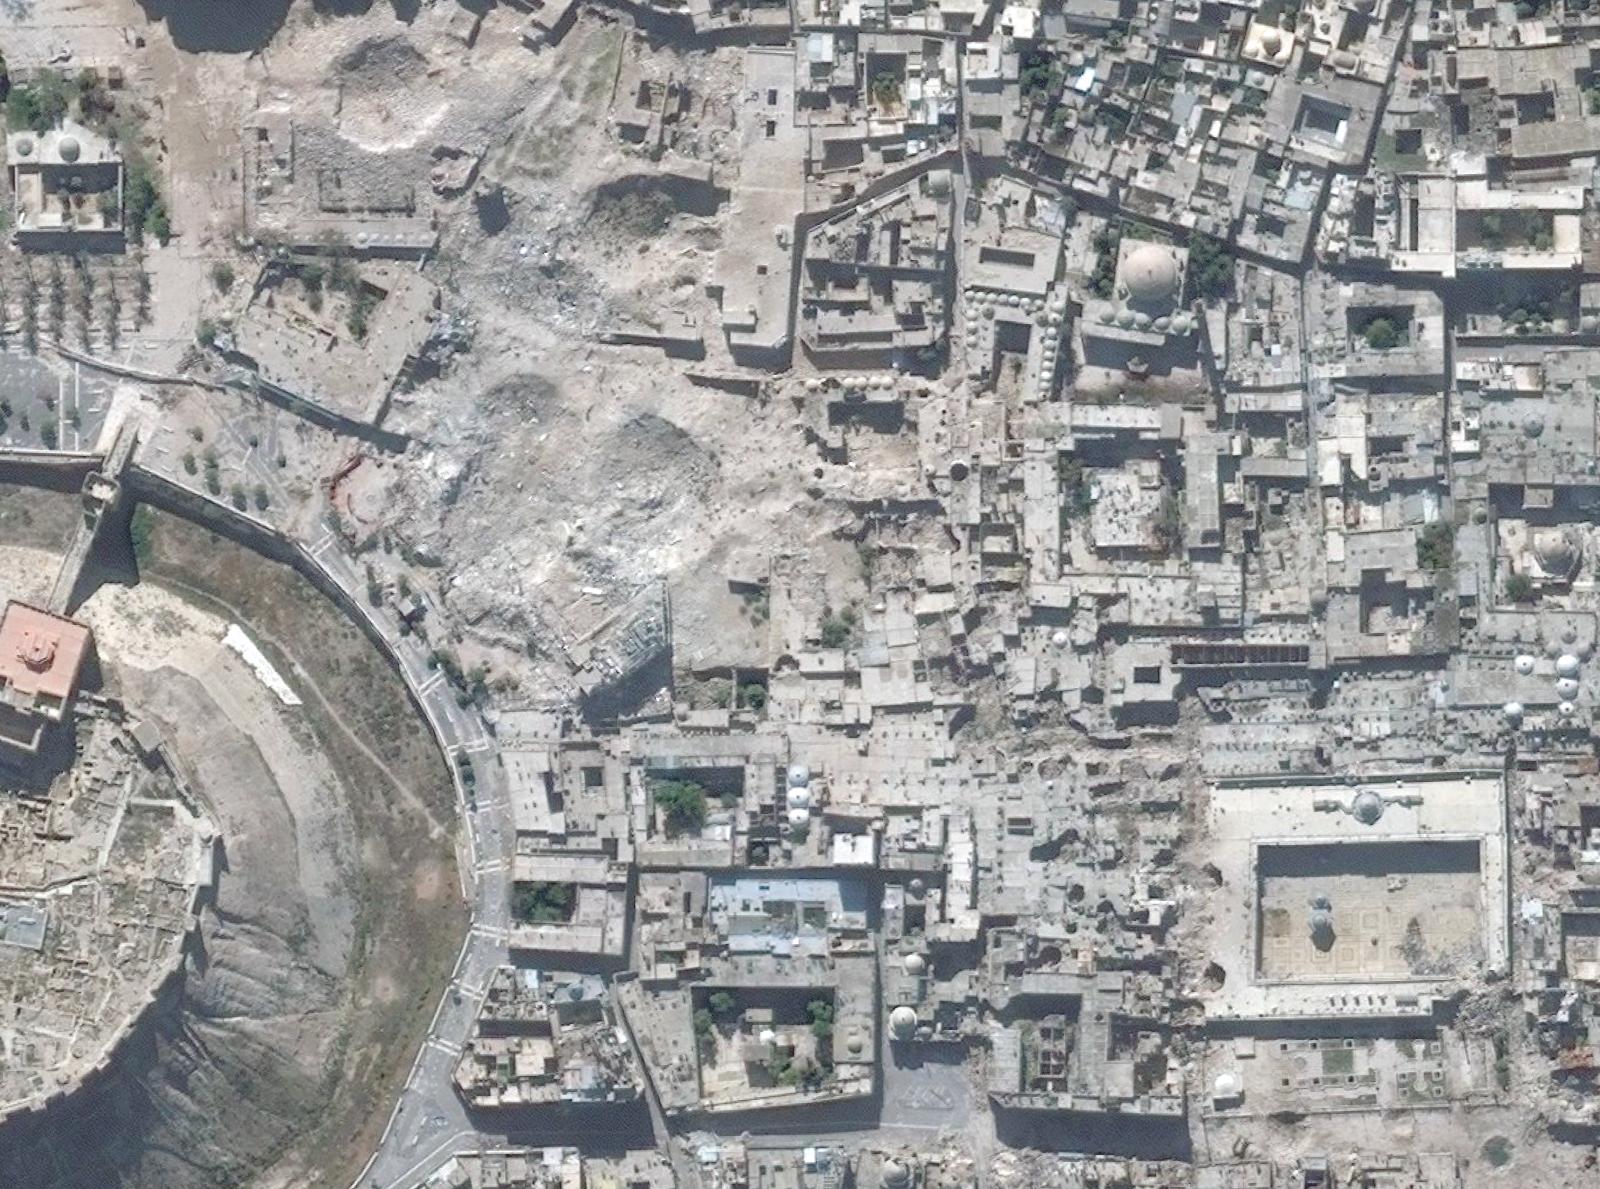 Old City, Aleppo